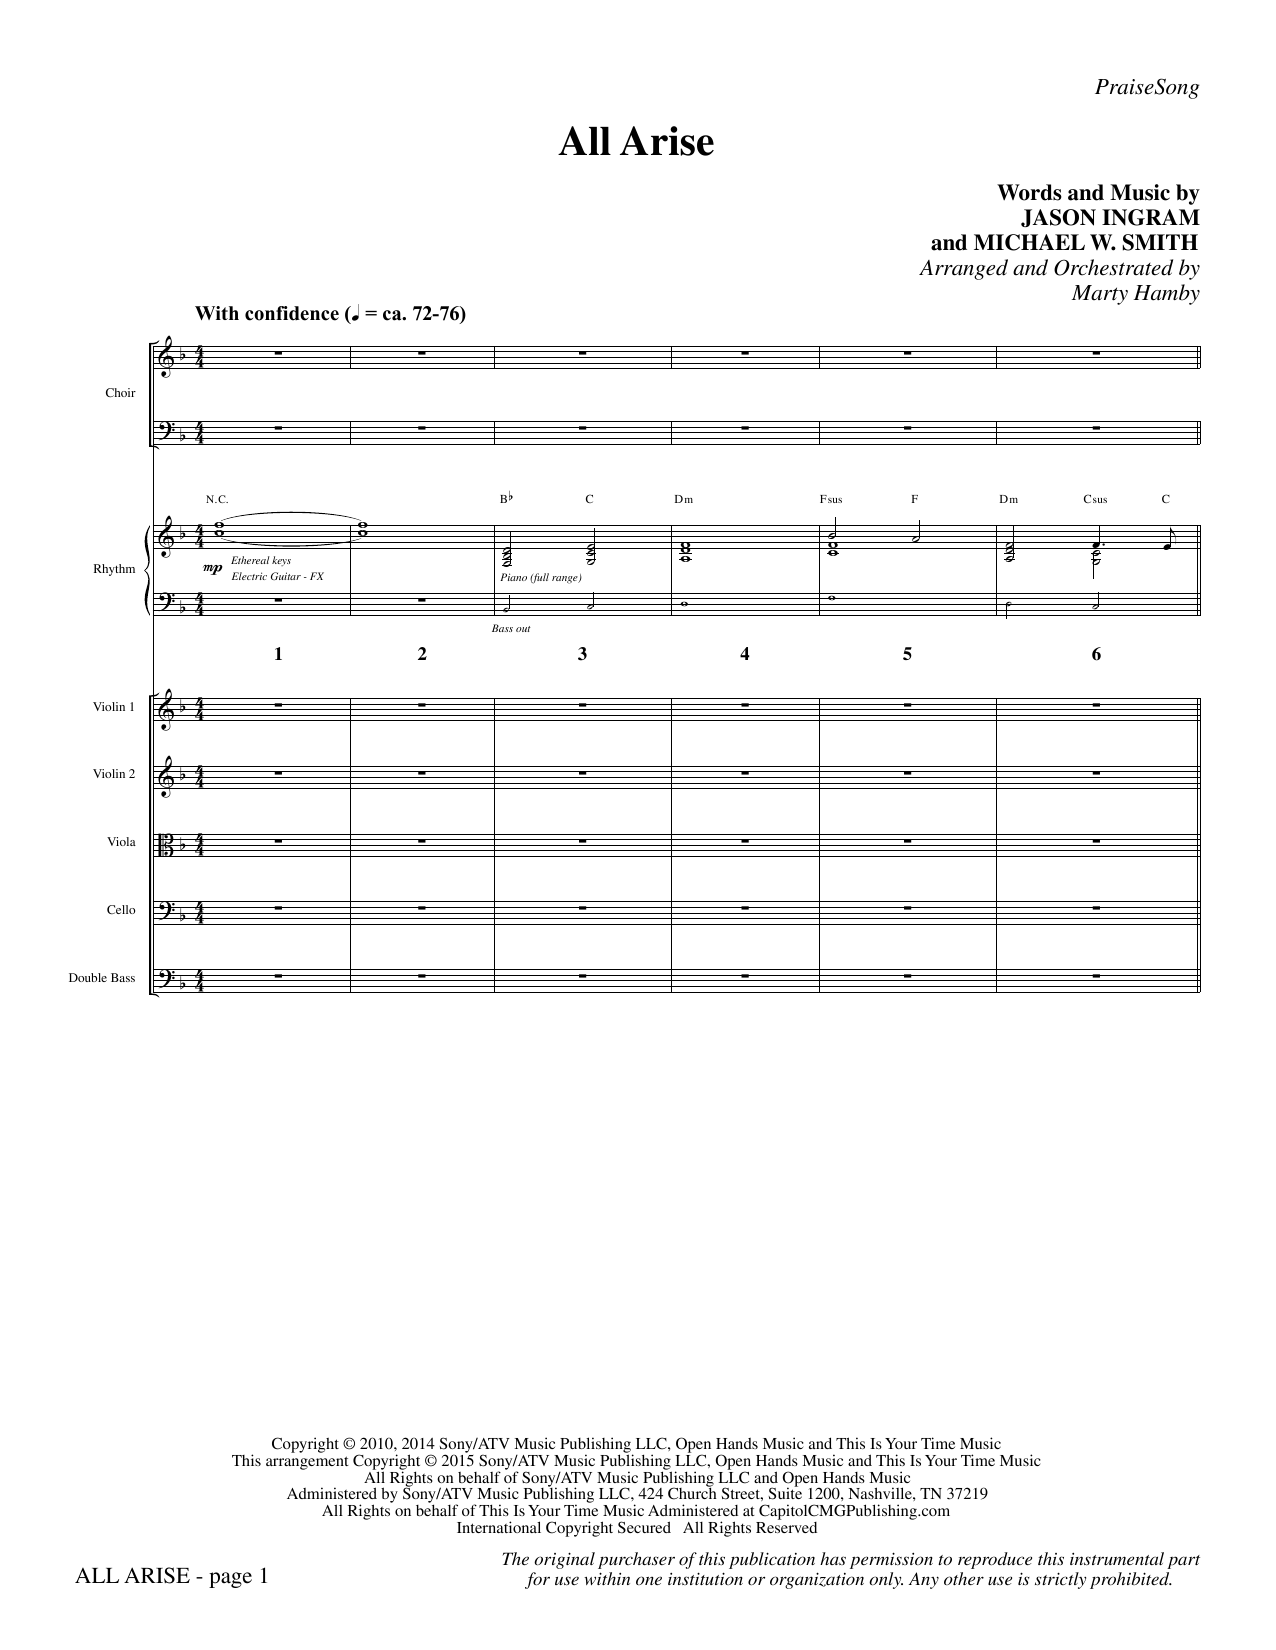 All Arise - Full Score sheet music